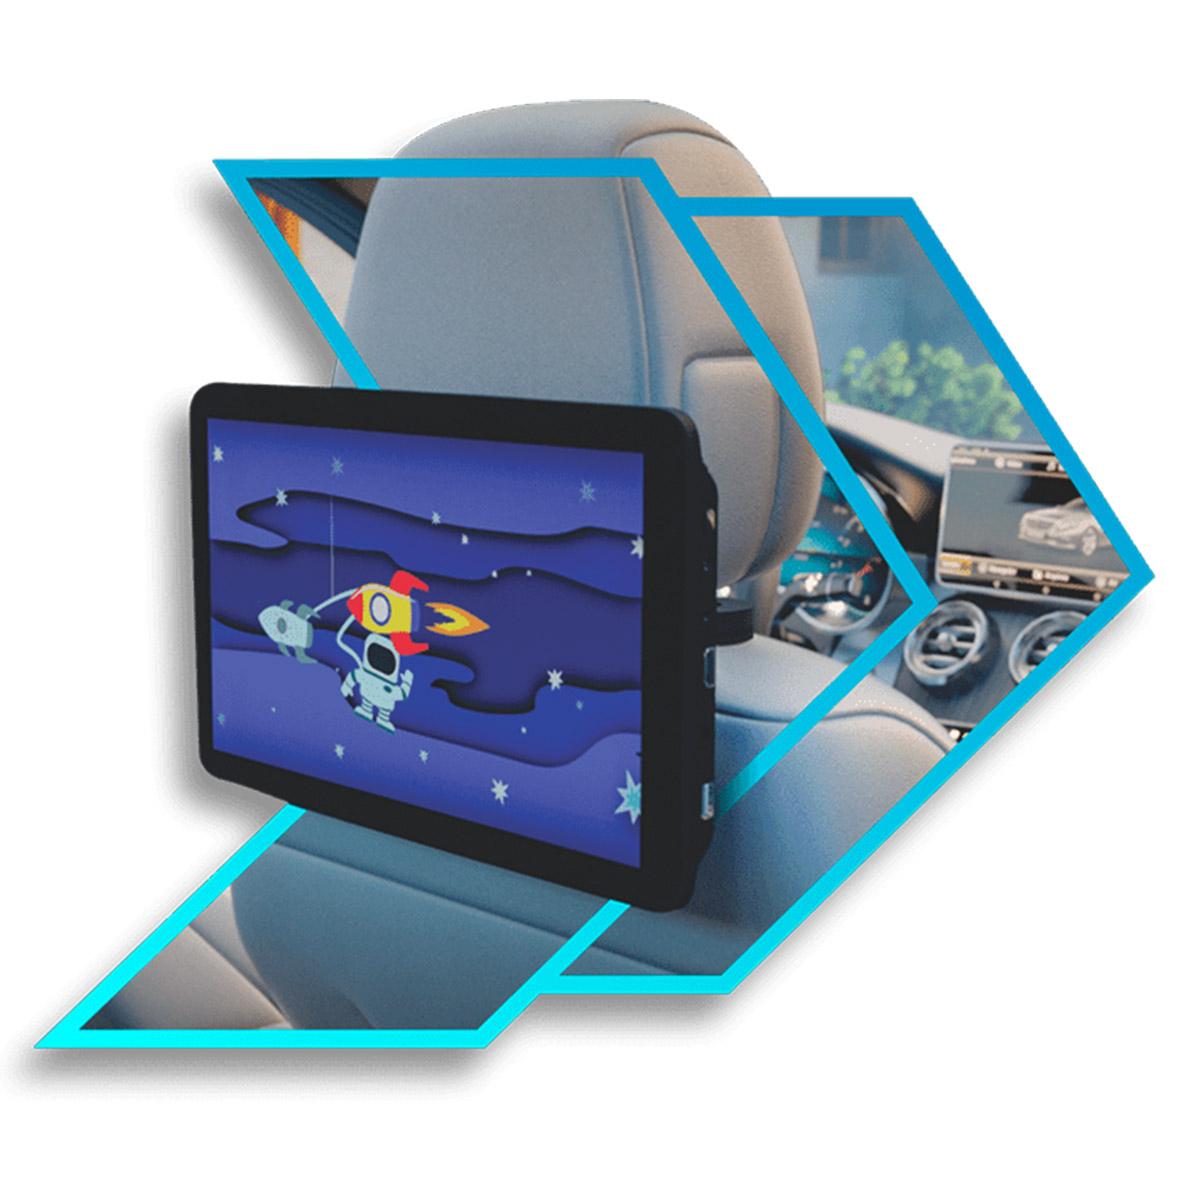 Par de Tela Encosto Cabeça Acoplavel Full HD Android 10 Faaftech FT-RSE